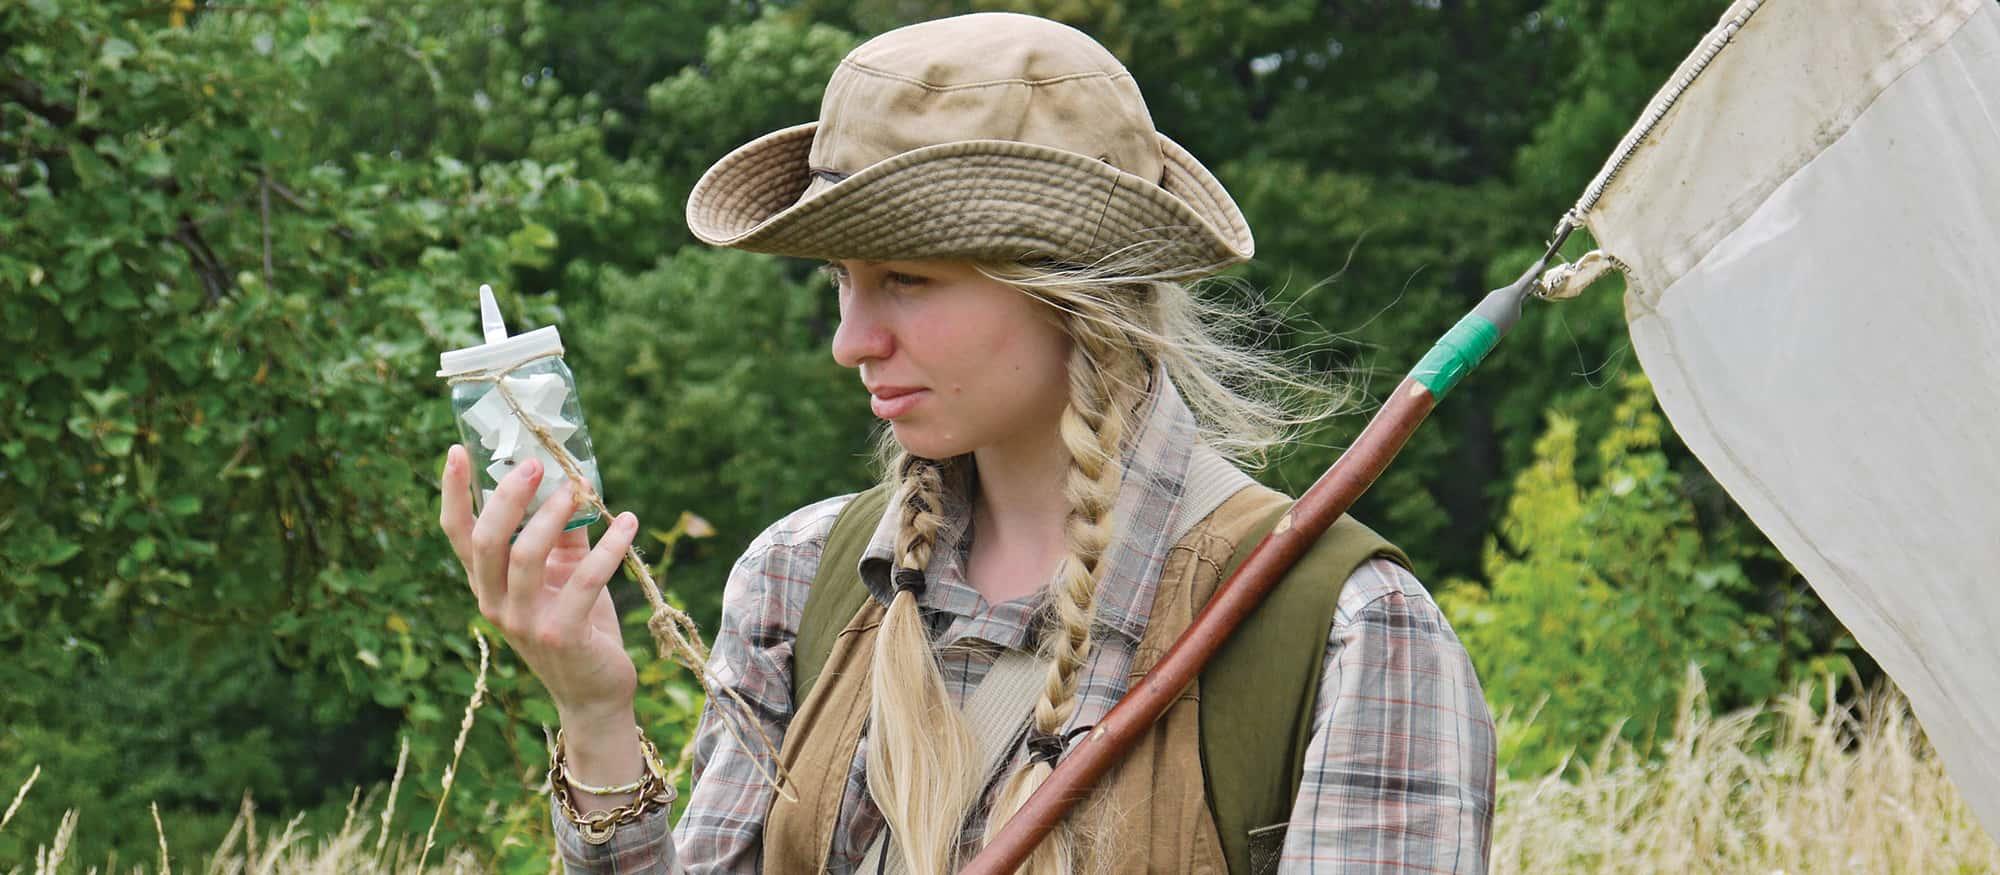 Wildlife Biologist student examining a specimen